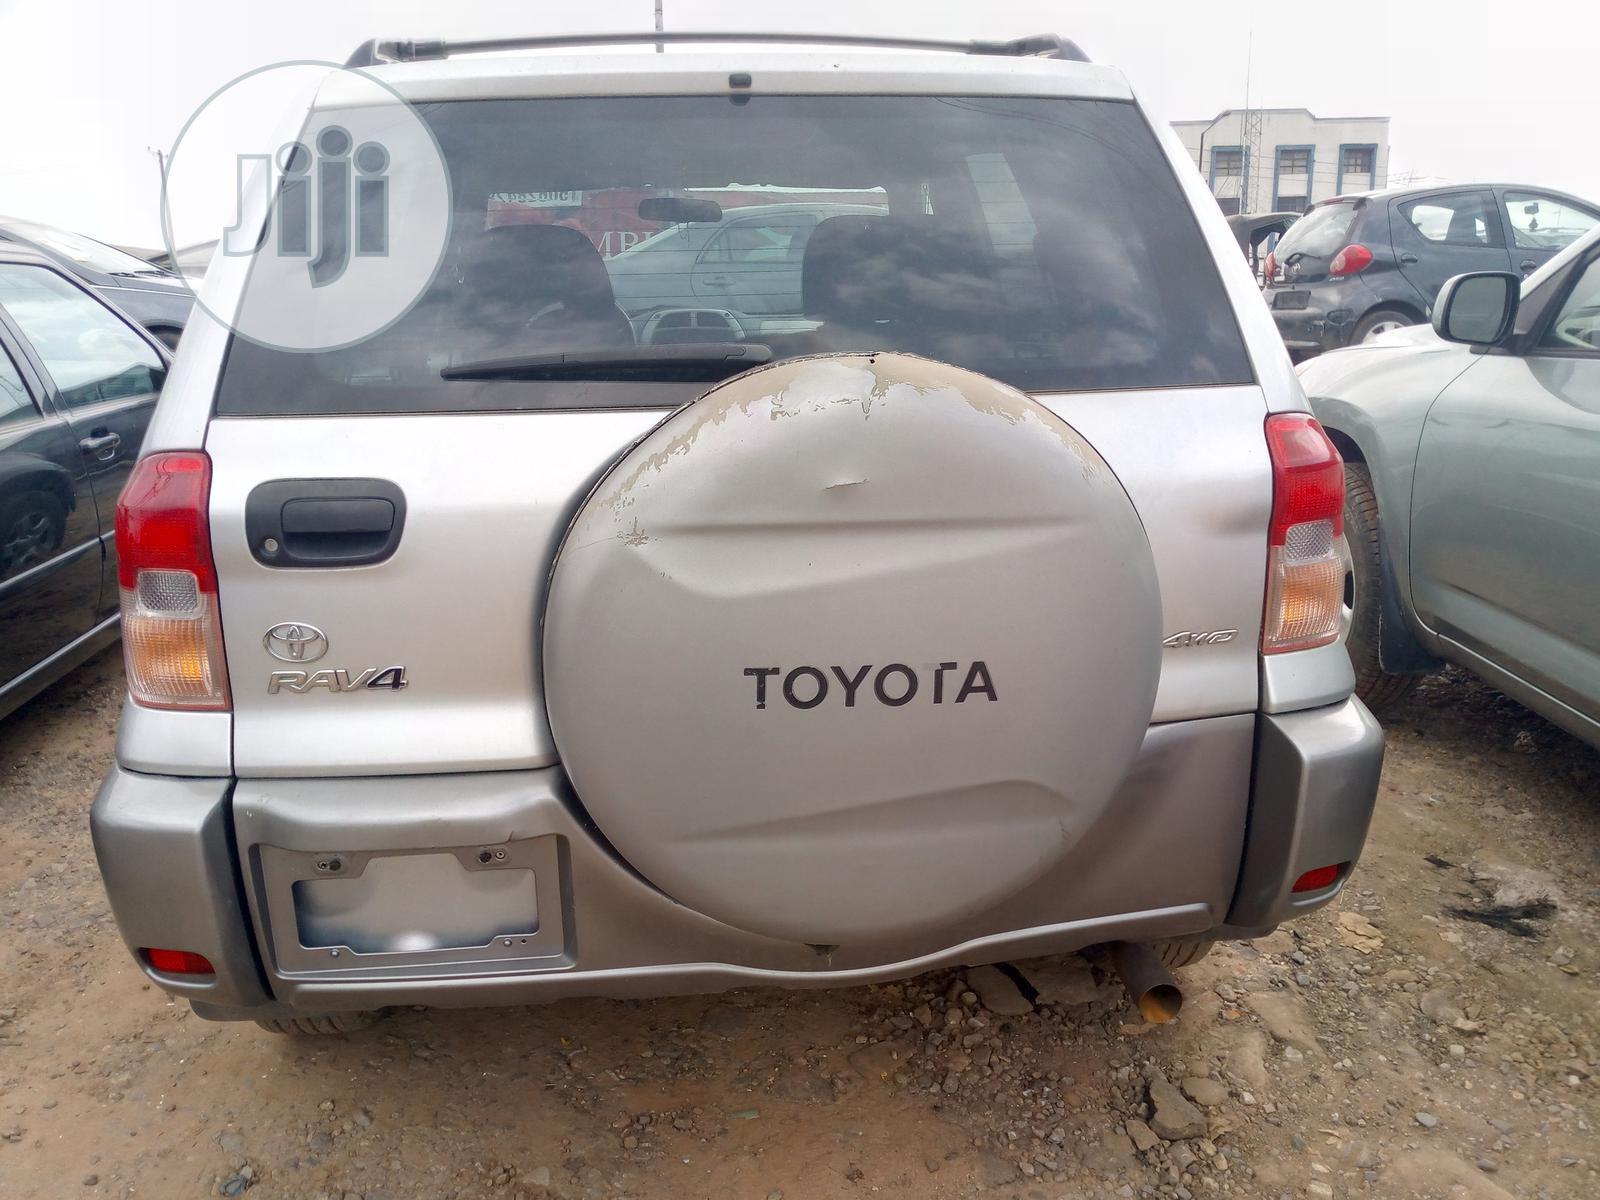 Toyota Rav4 2004 2 0 4x4 Executive Silver In Lagos State Cars Sunday Daniel Jiji Ng